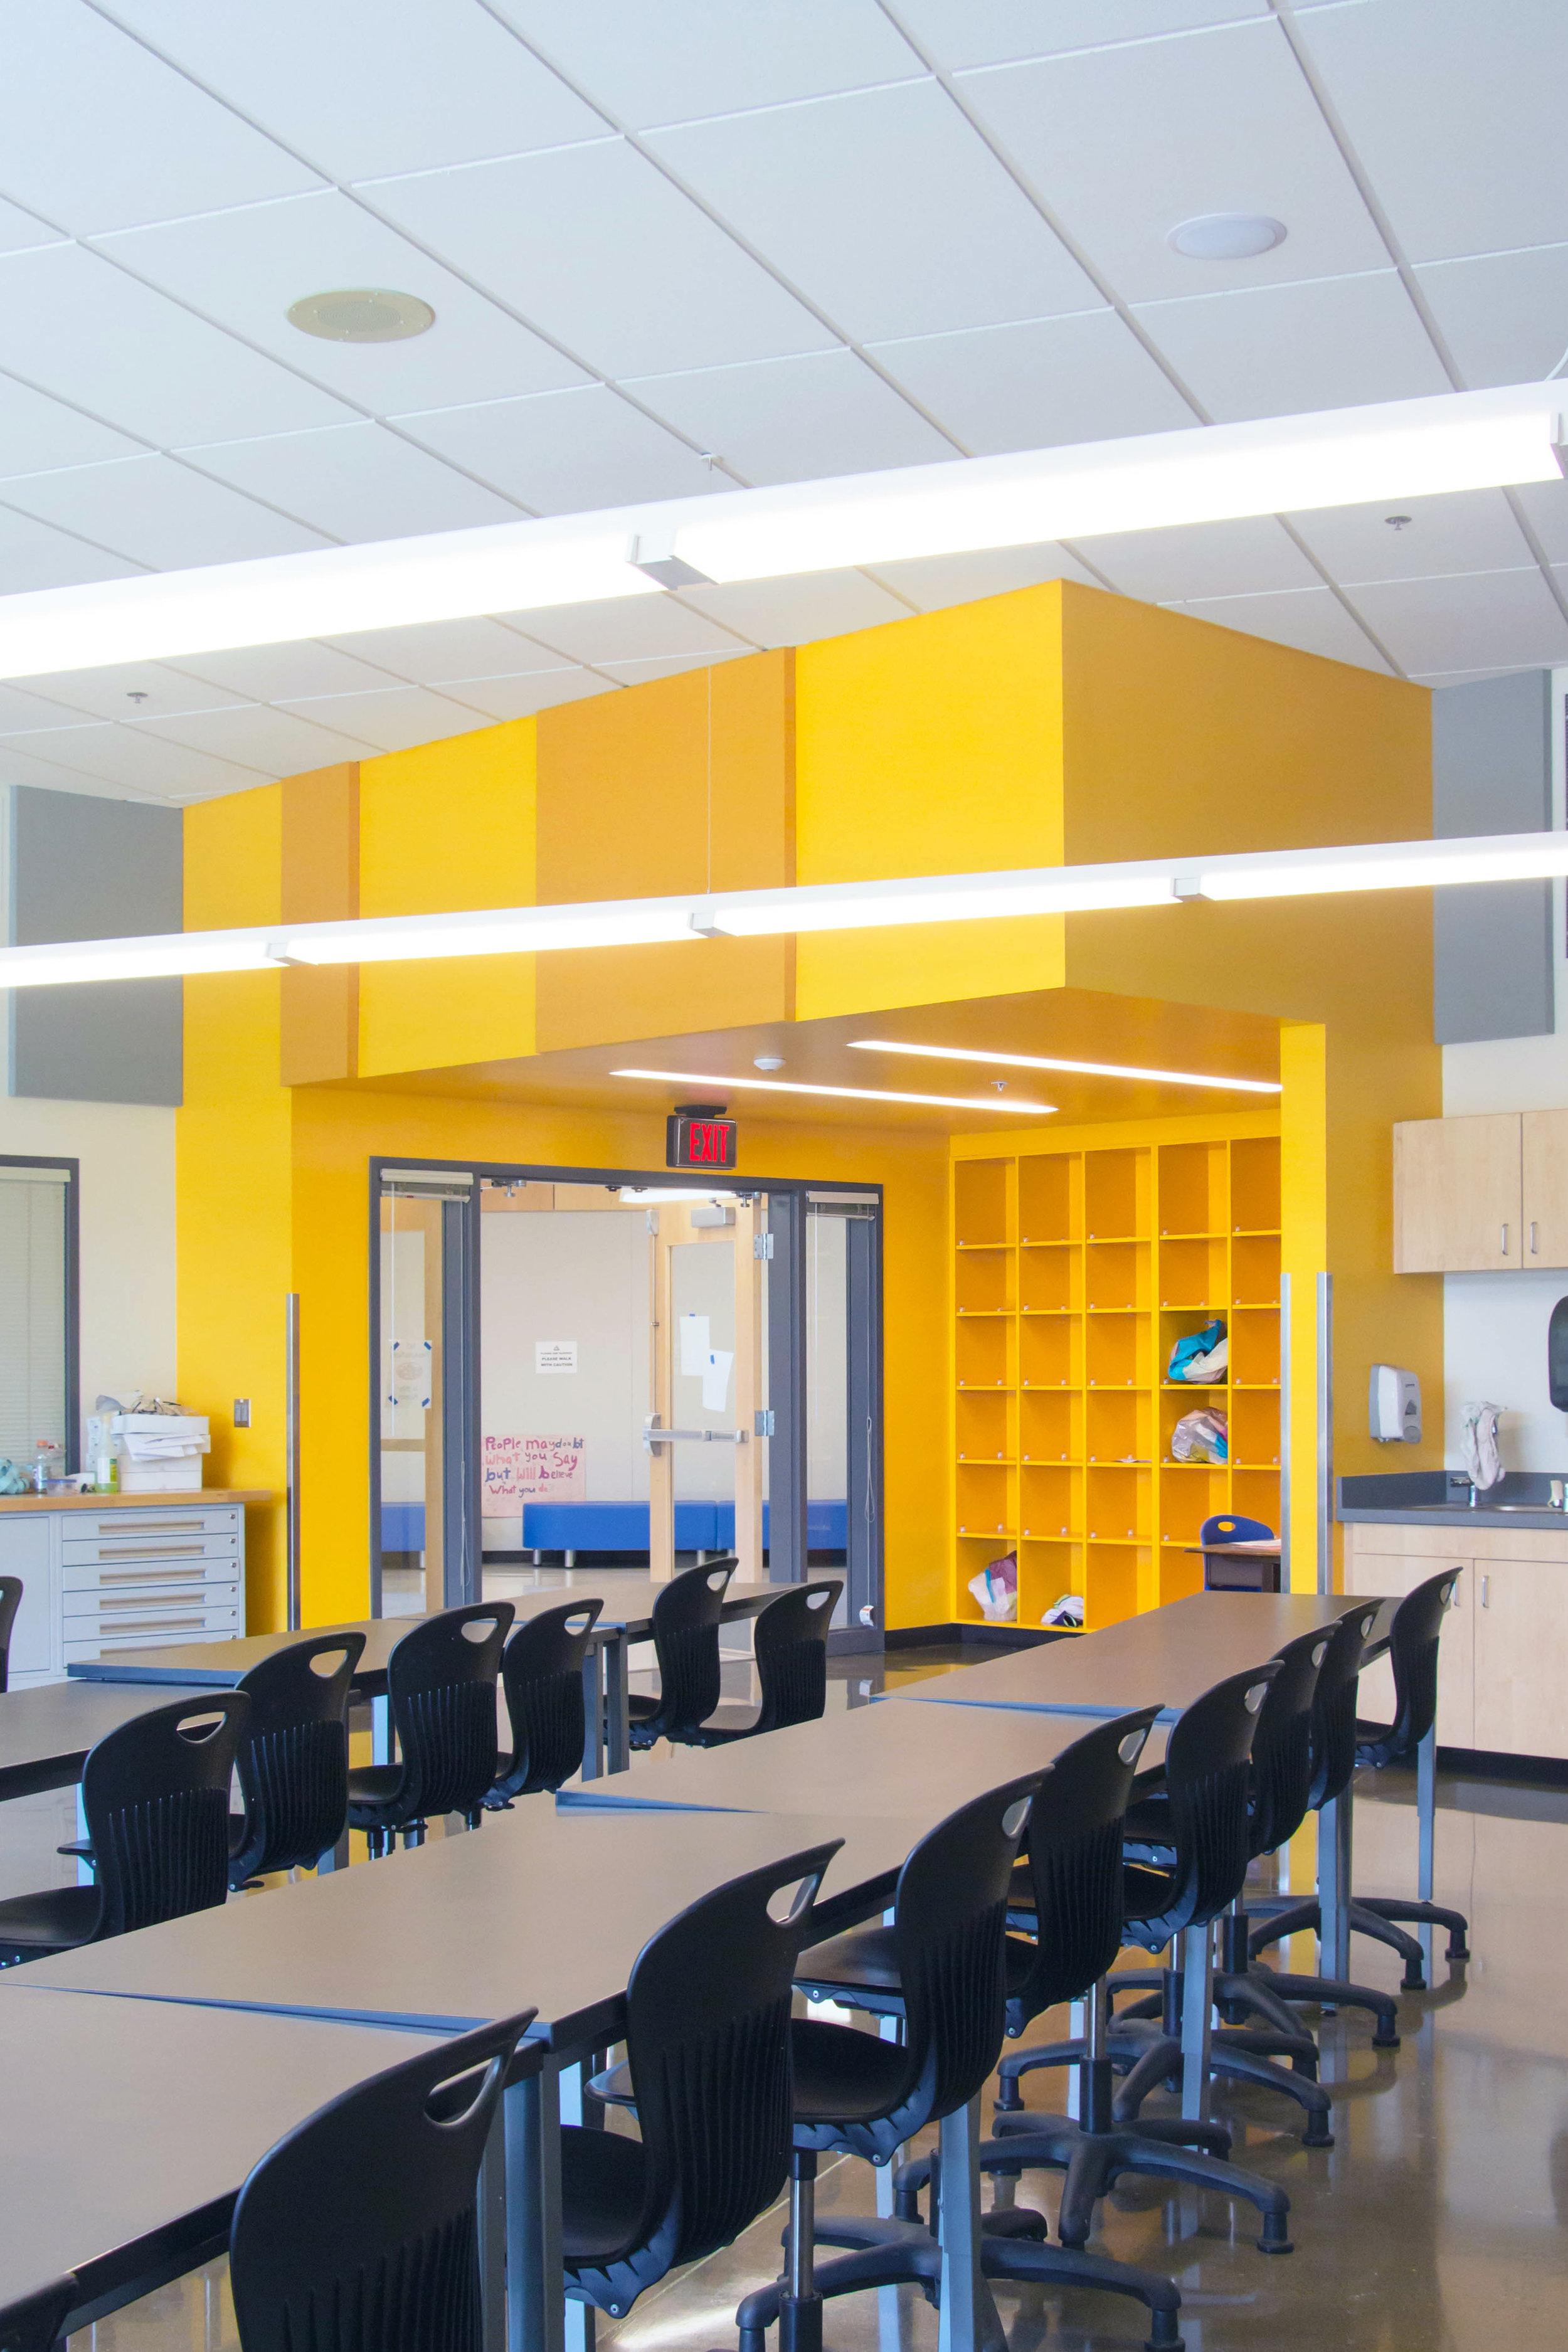 Gilham Elementary School - Classroom